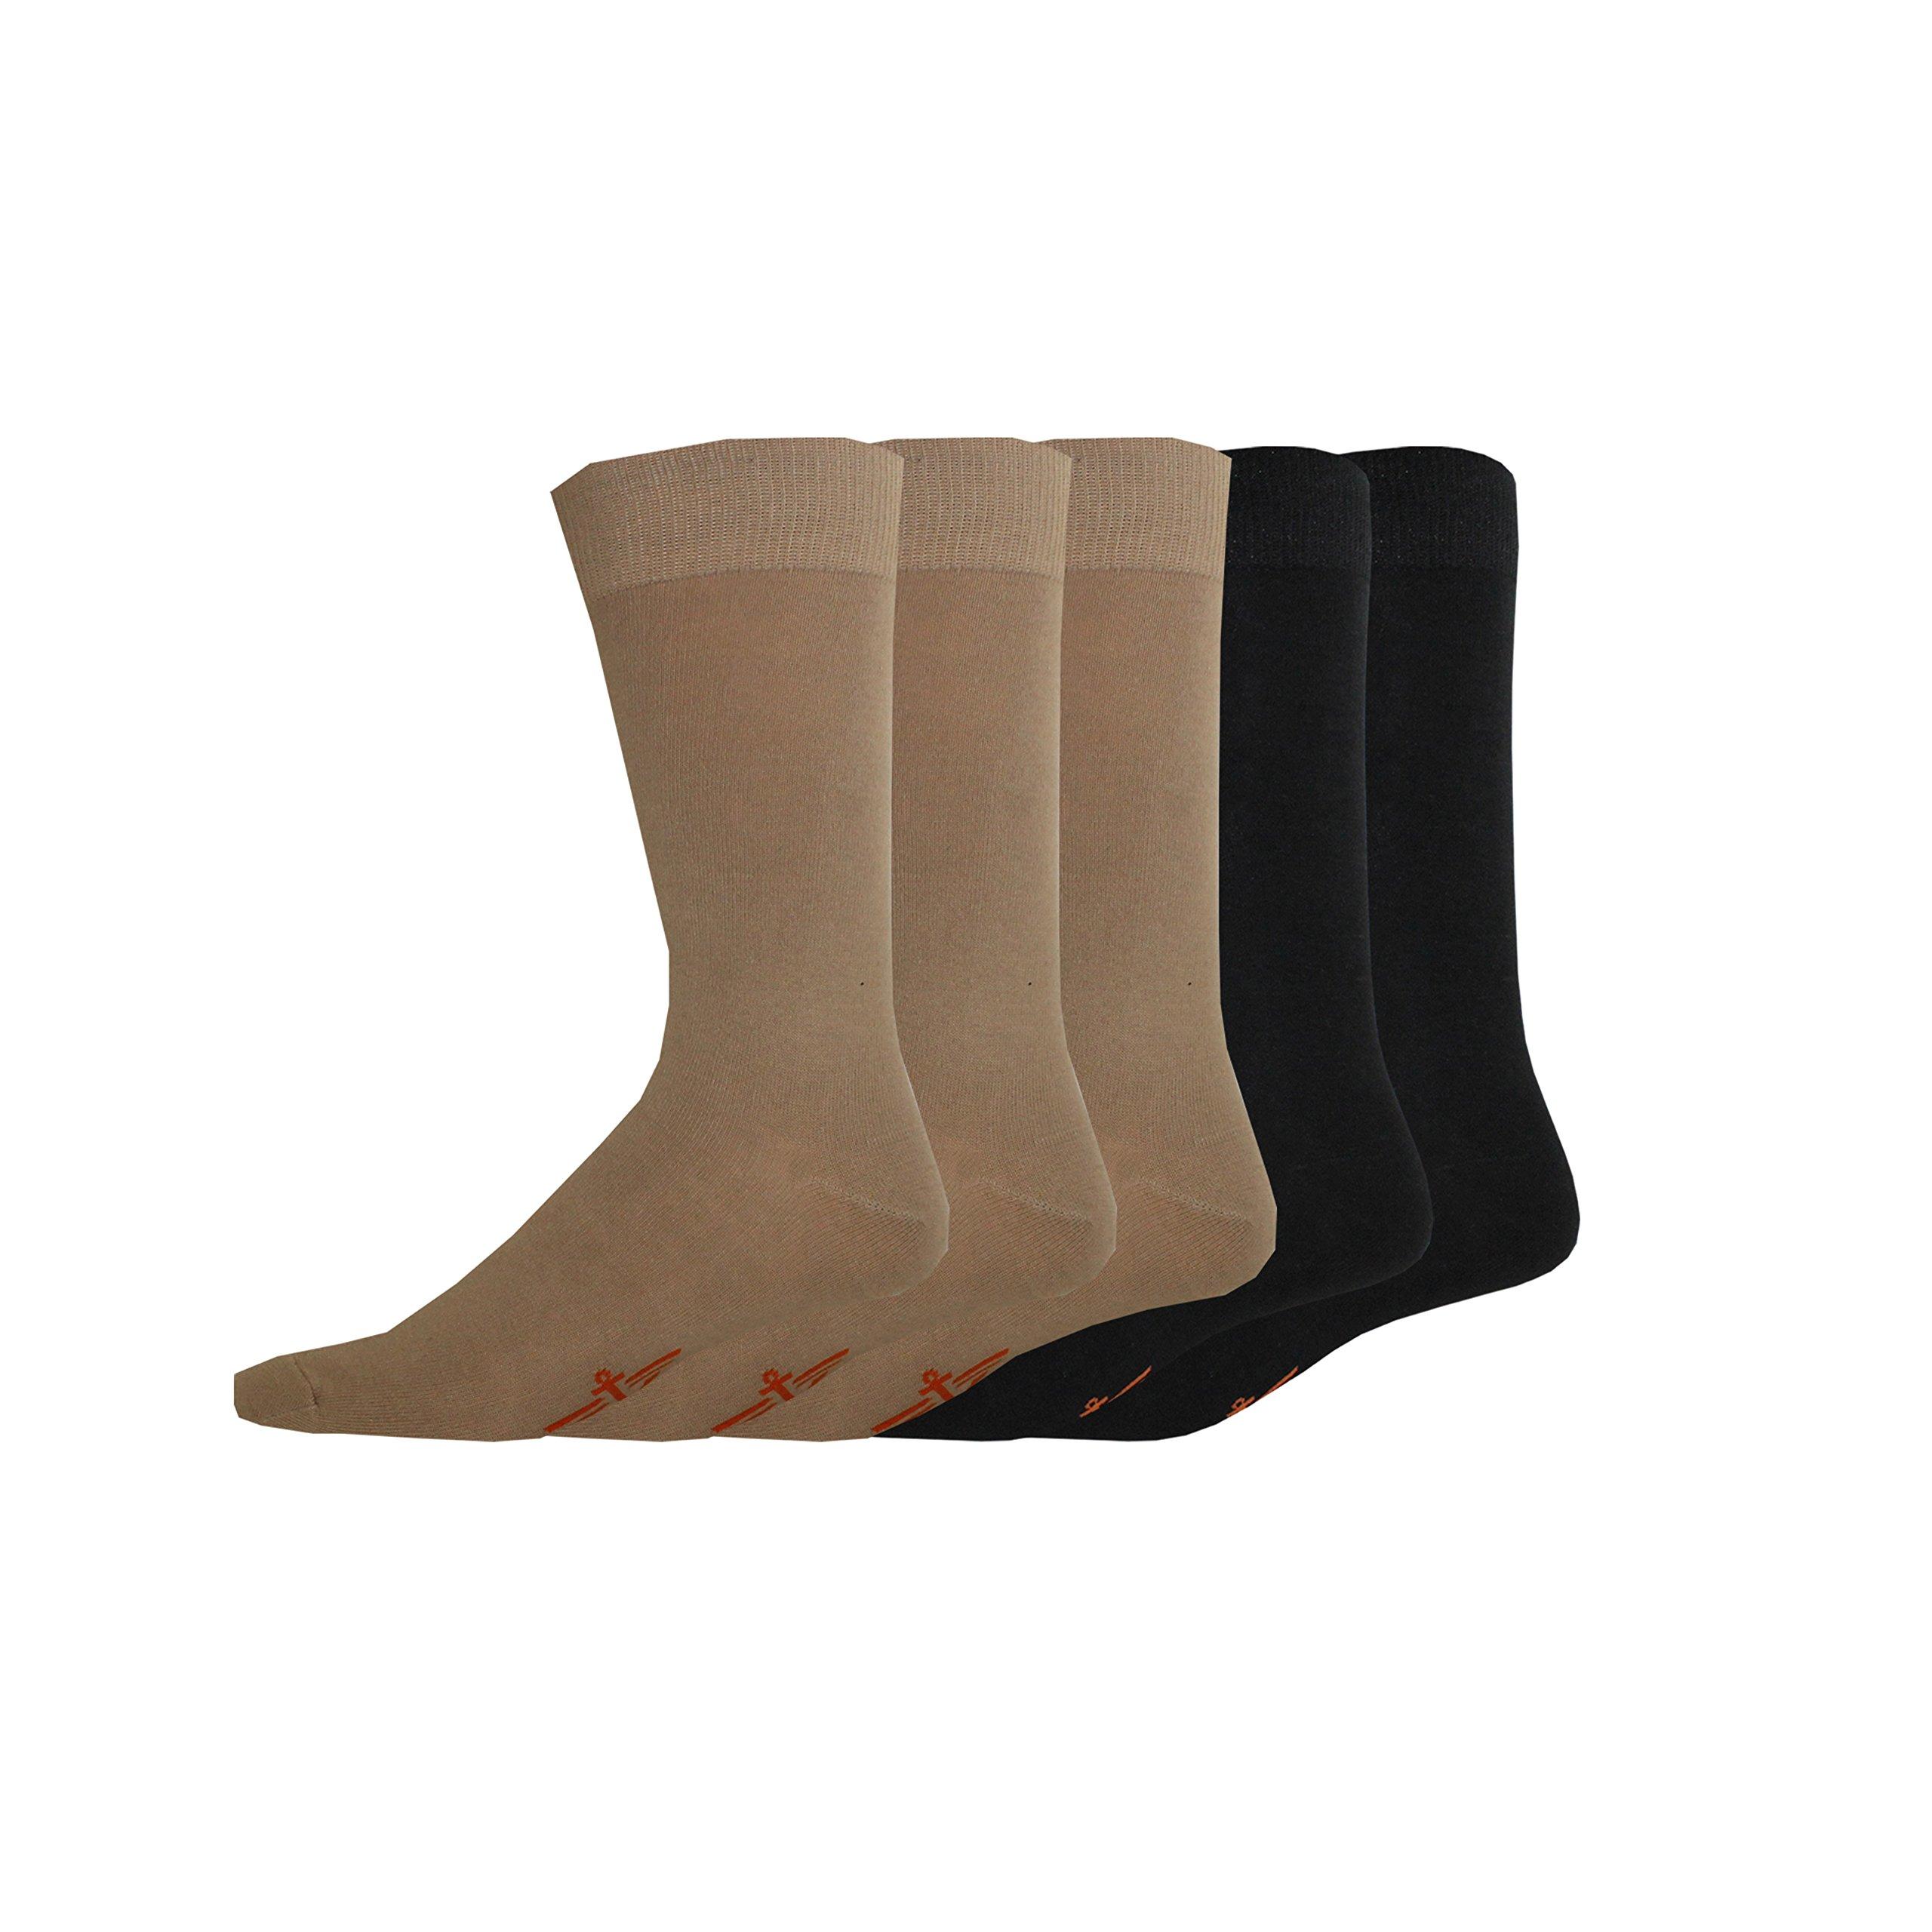 Dockers Men's 5 Pack Classics Dress Flat Knit Crew, Khaki Assorted, Sock Size:10-13/Shoe Size: 6-12